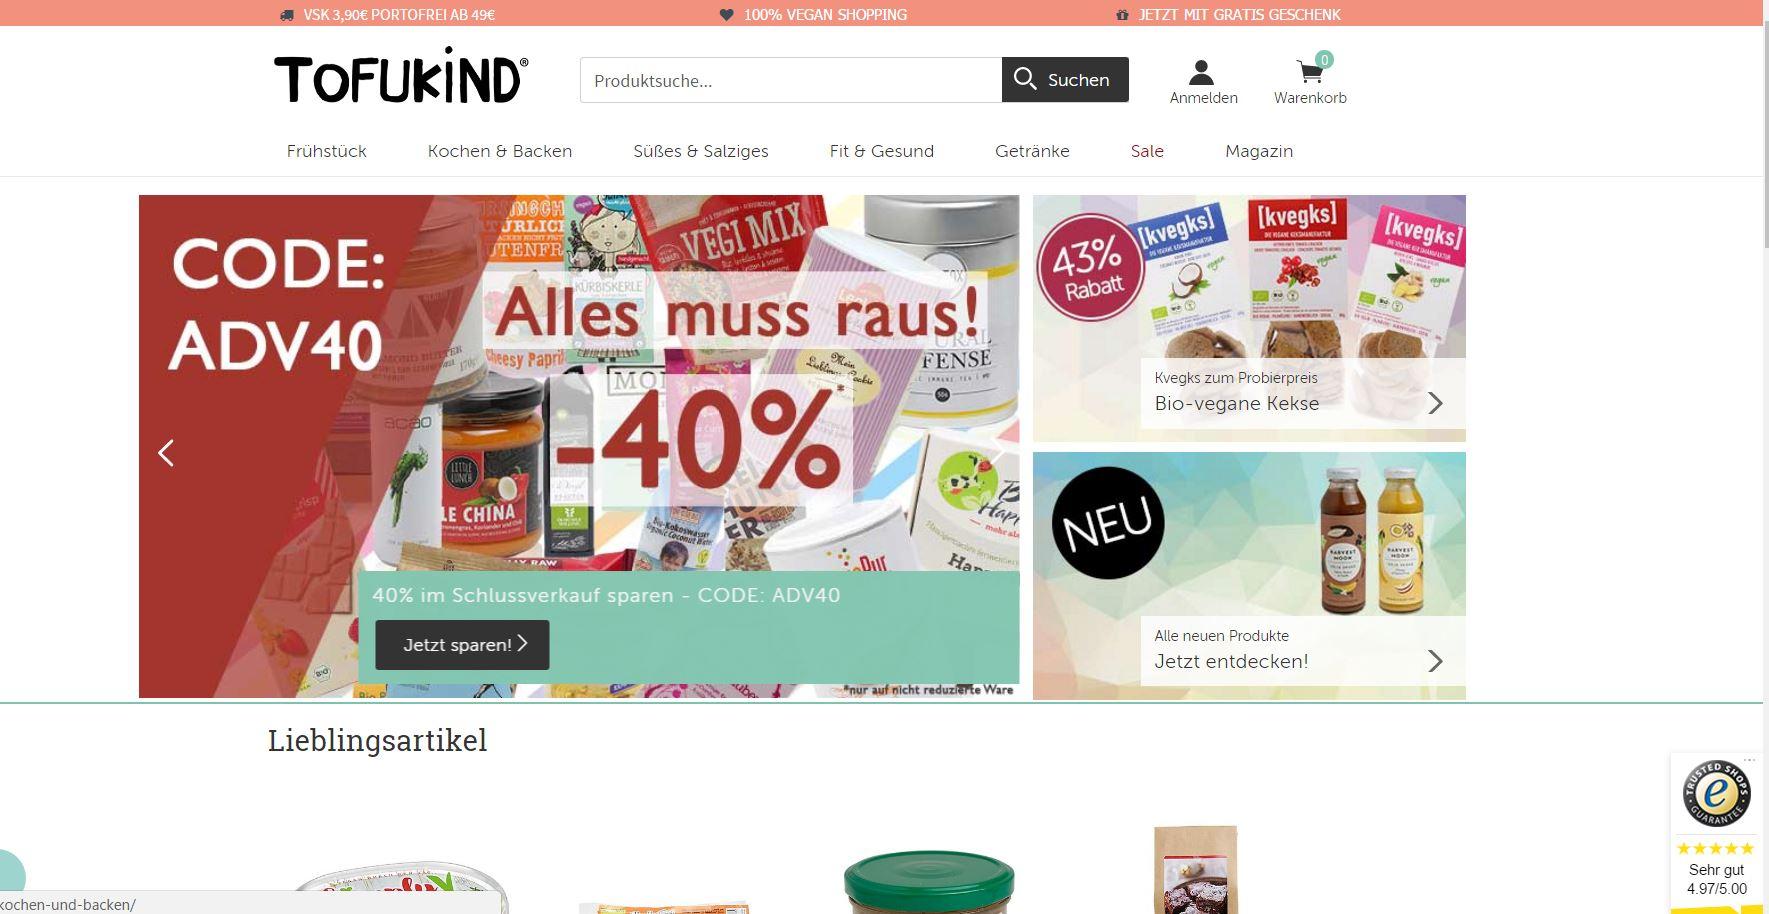 40% Rabatt auf alles bei Tofukind.de - auch auf SALE-Artikel (Teatox etc.)